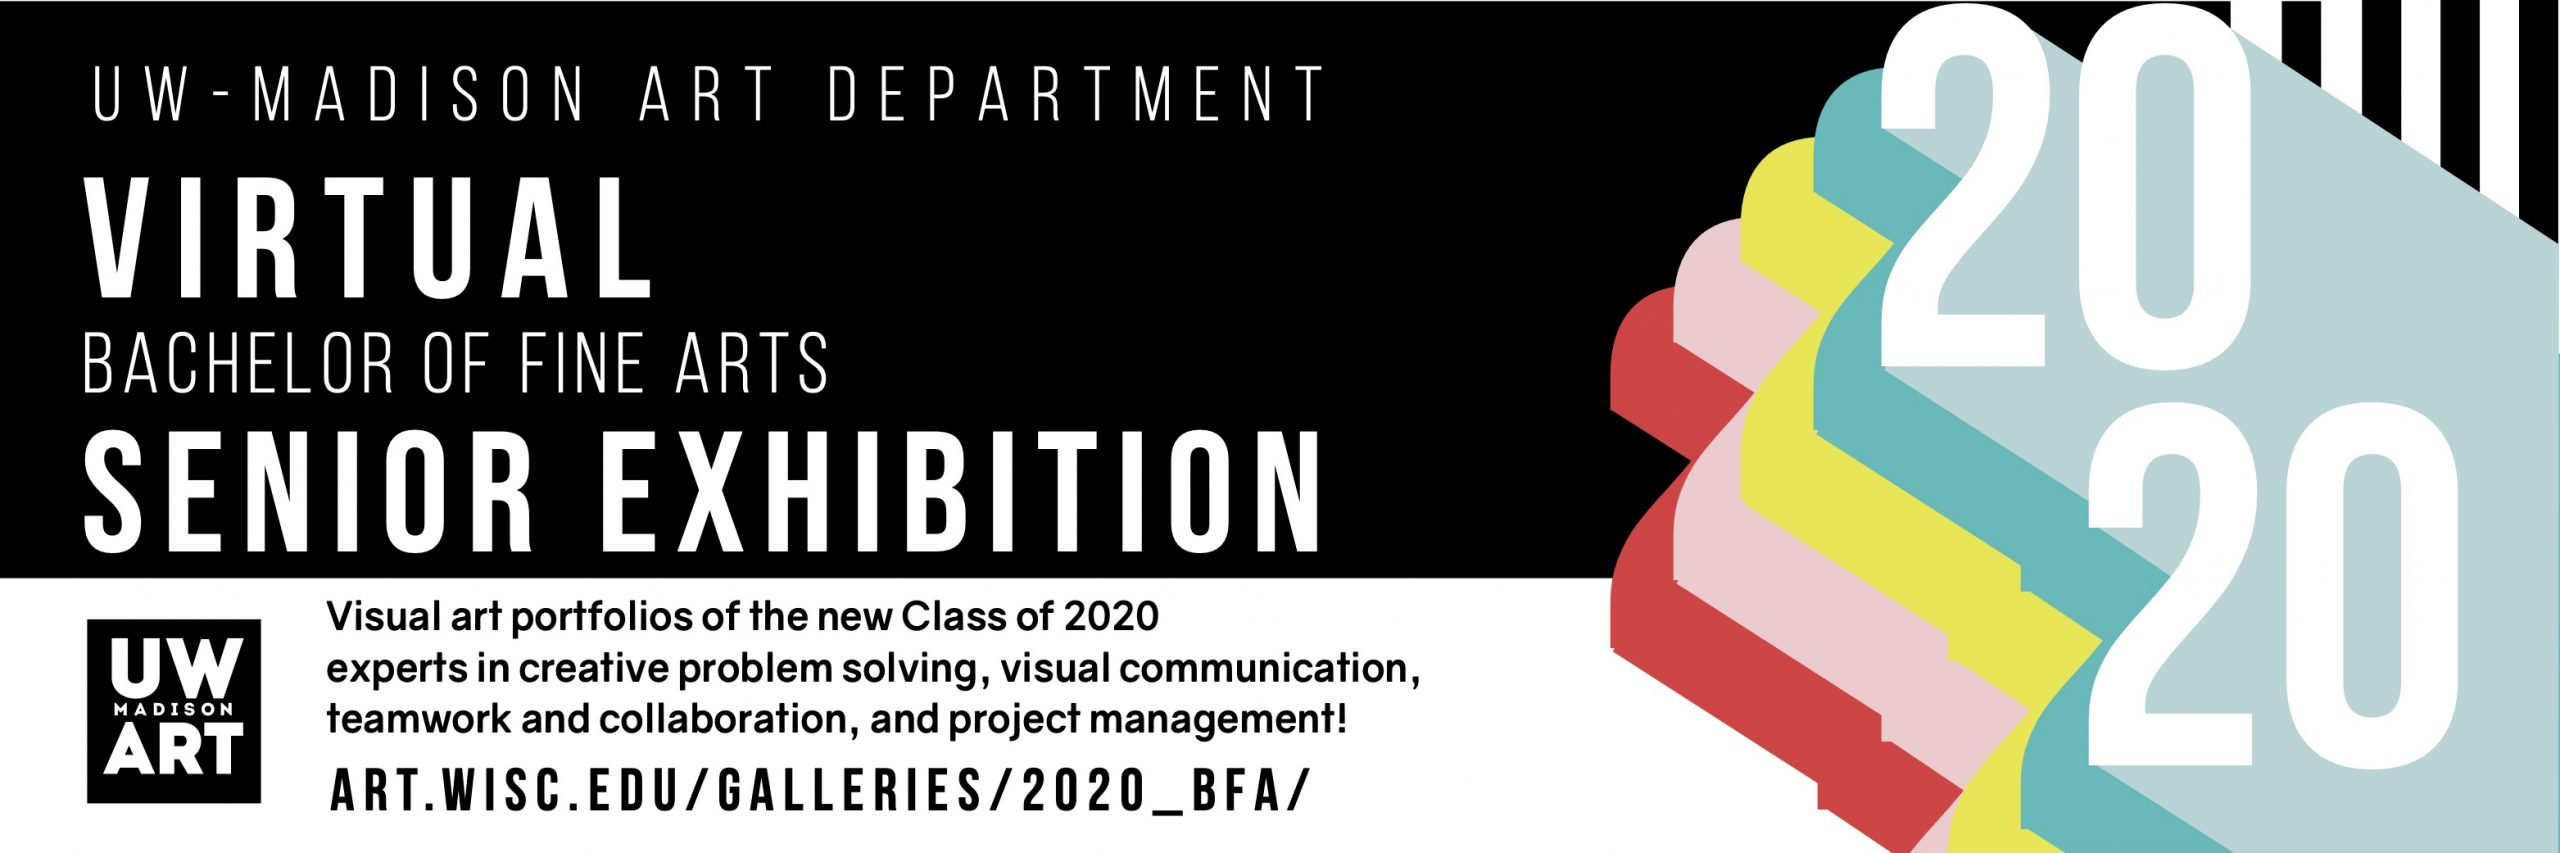 2020 UW Art Virtual BFA Senior Exhibition banner